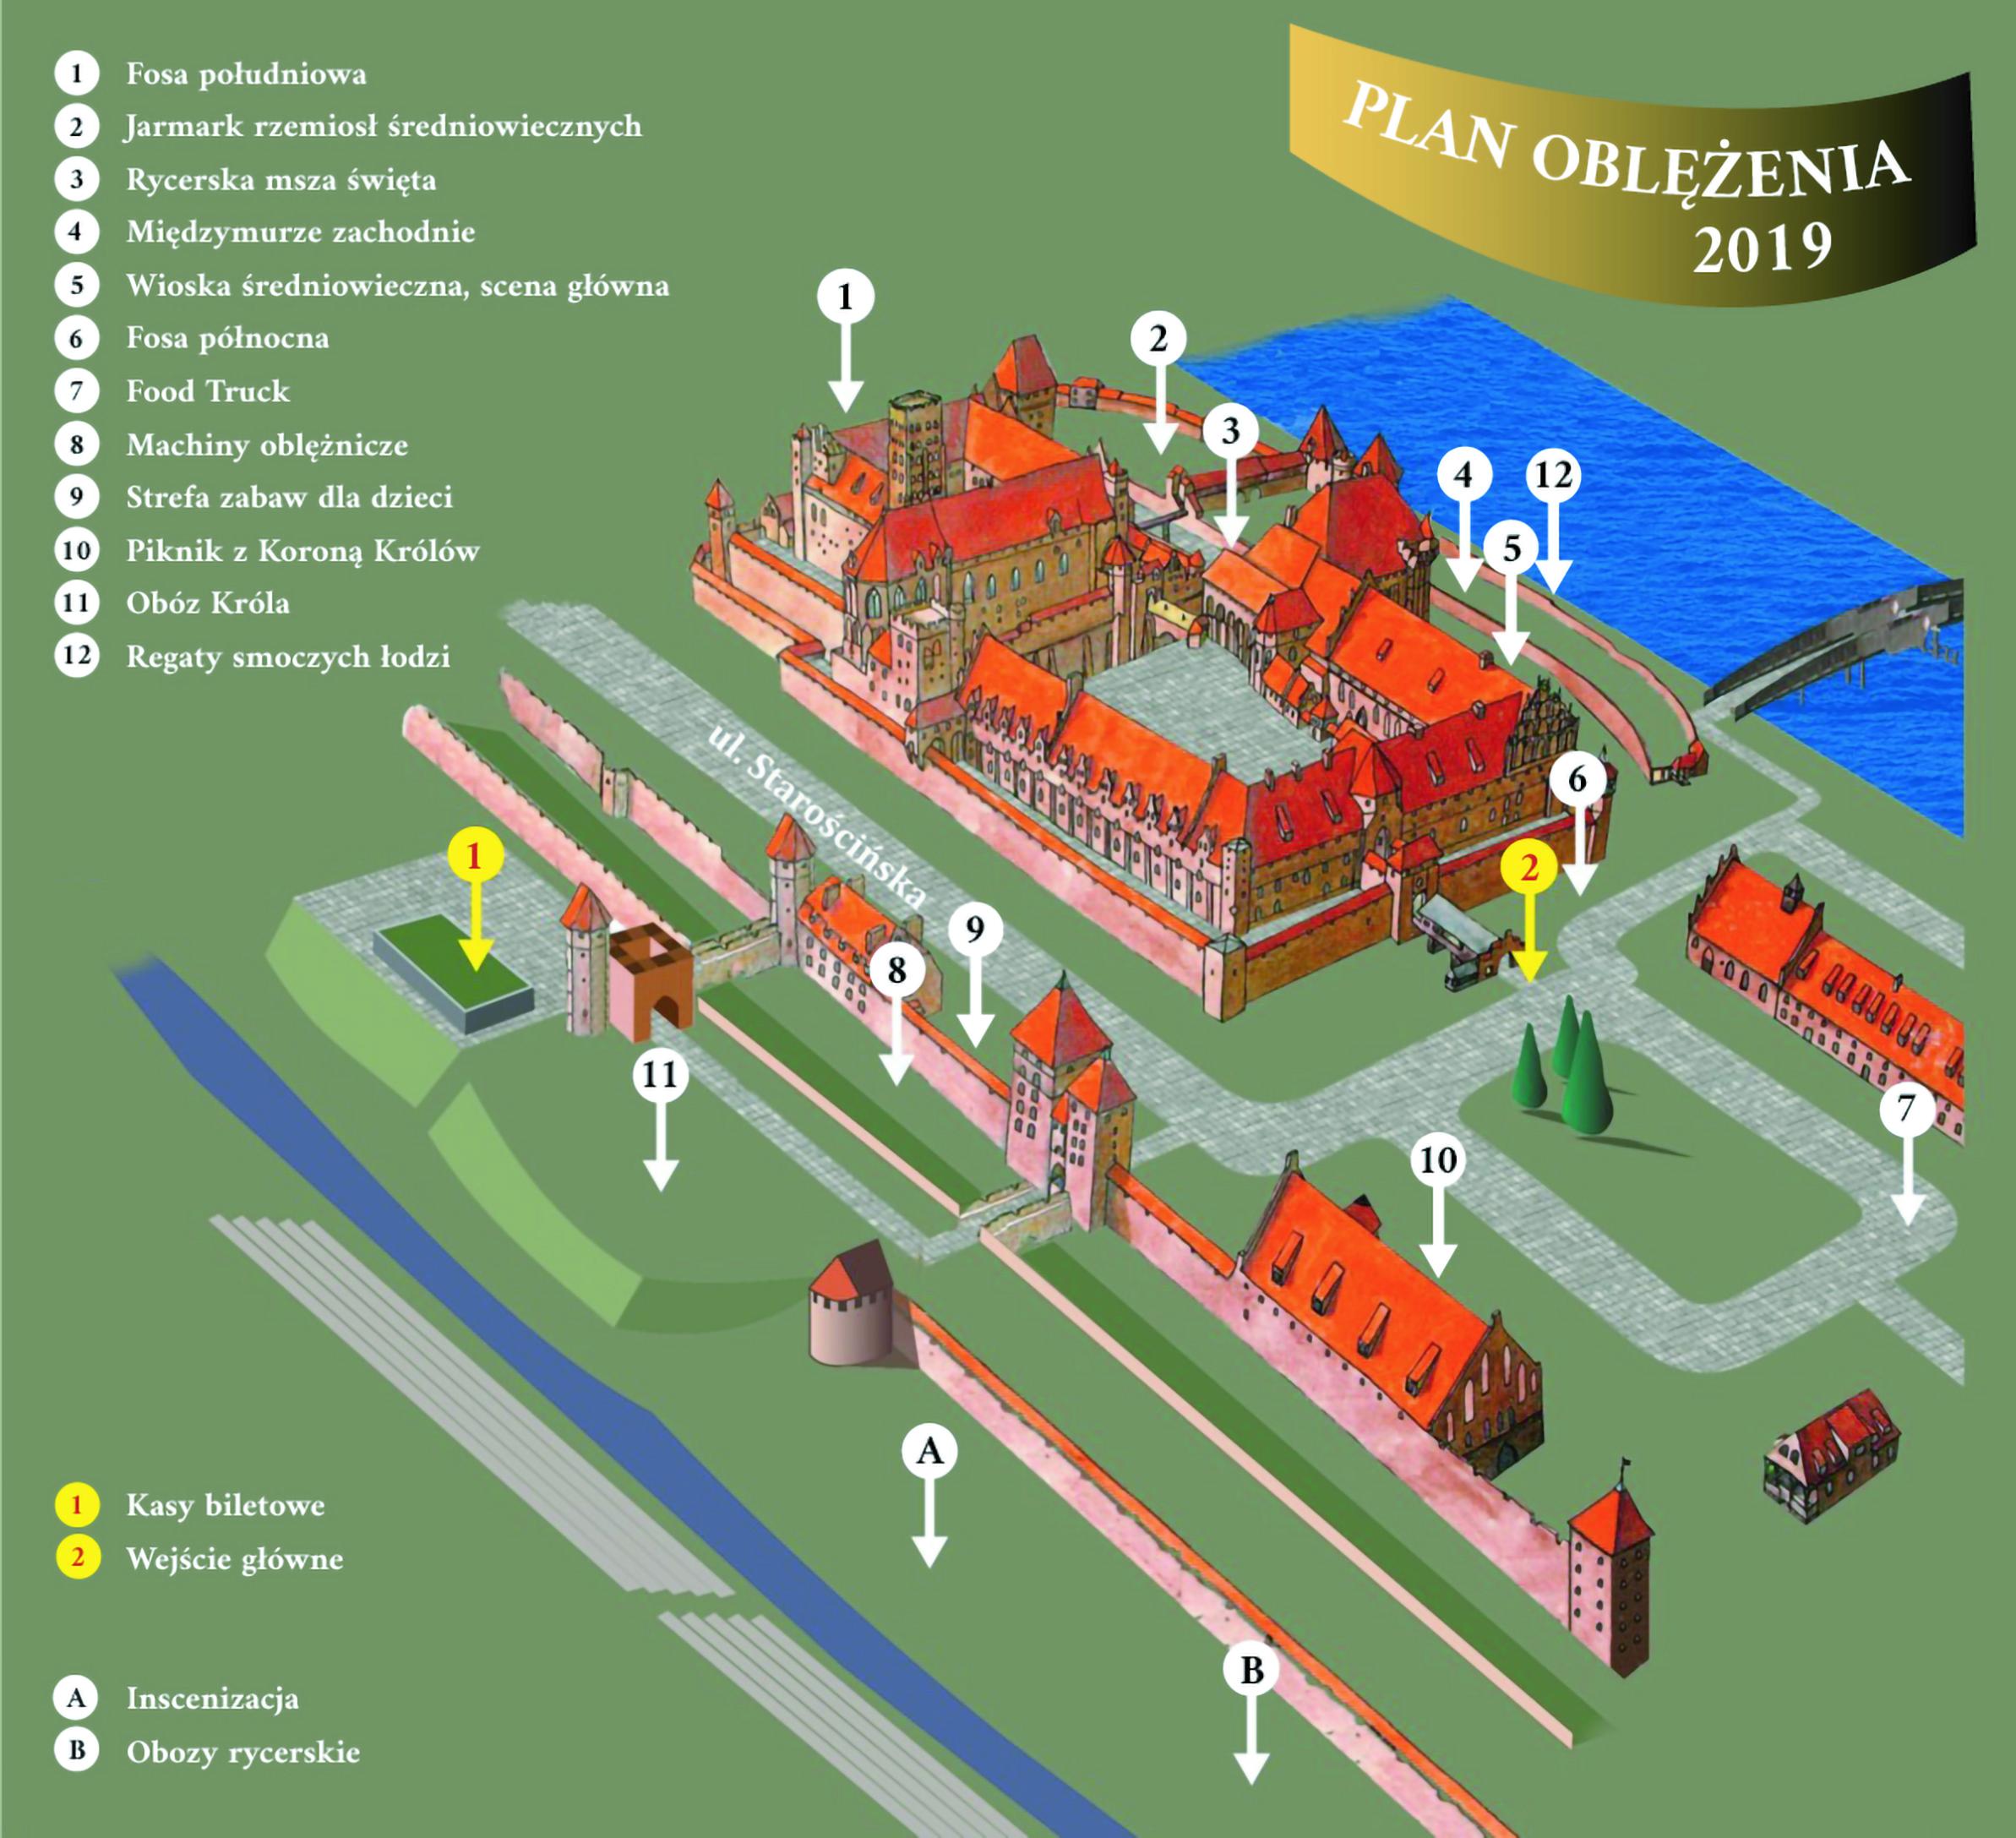 http://m.82-200.pl/2019/07/orig/mapka-plan-oblezenia-2019-4744.jpg